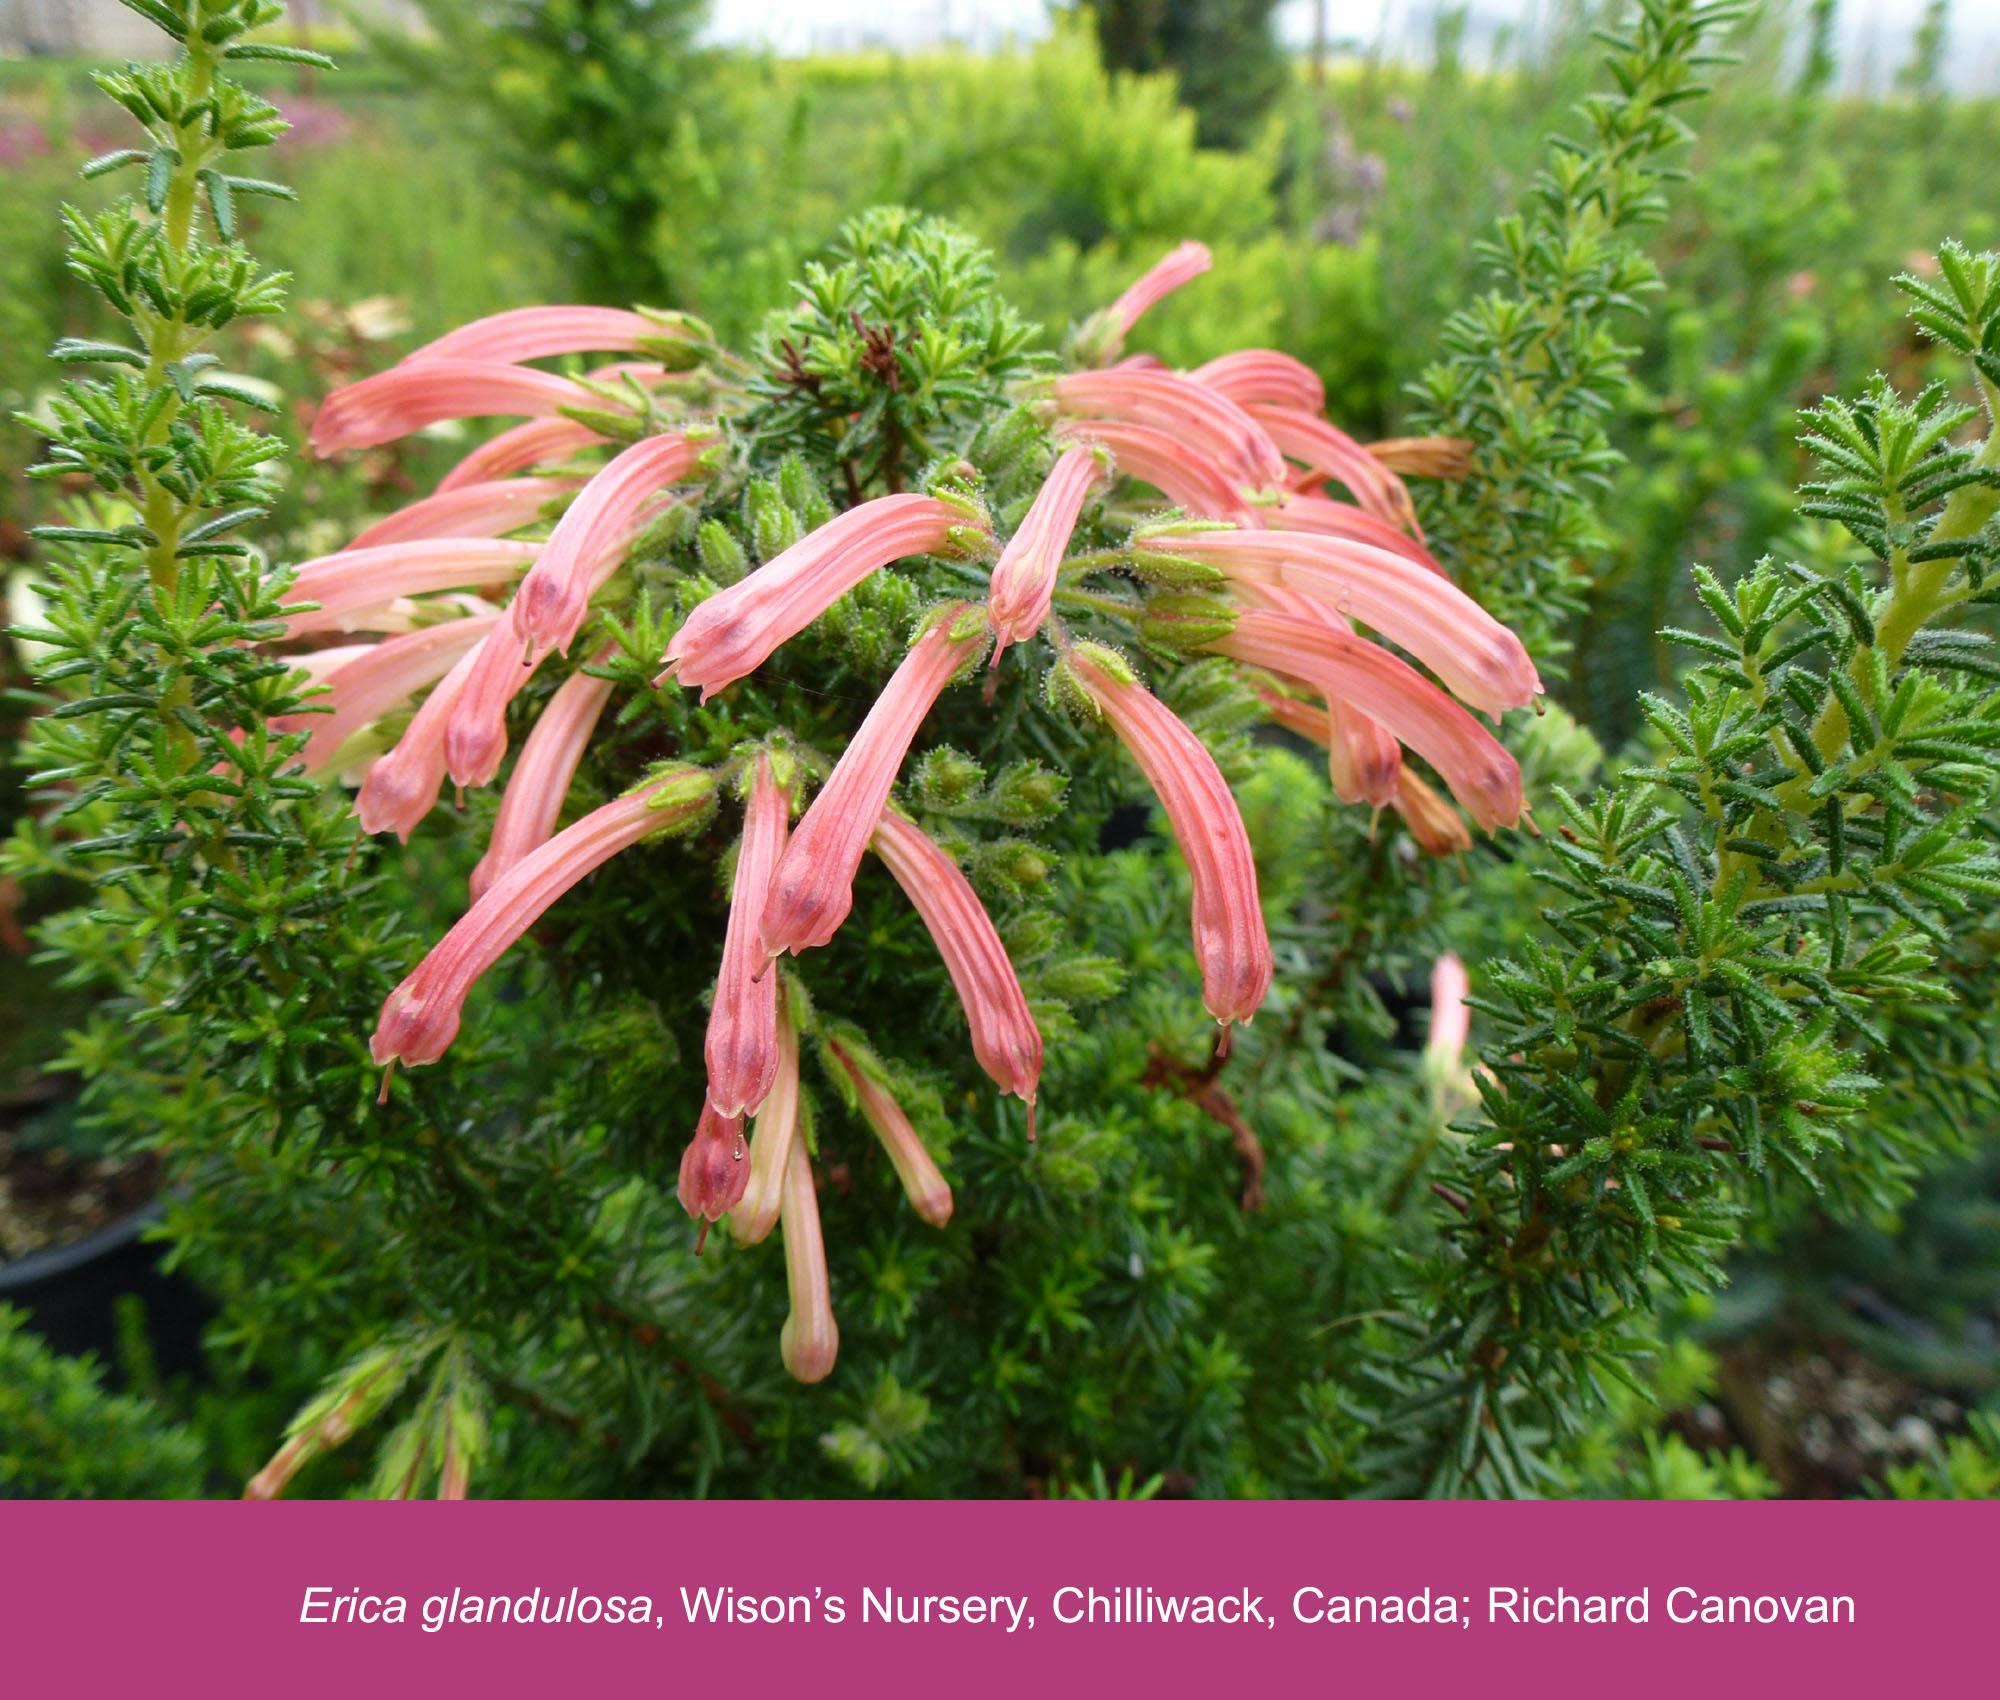 Erica glandulosa subsp. glandulosa